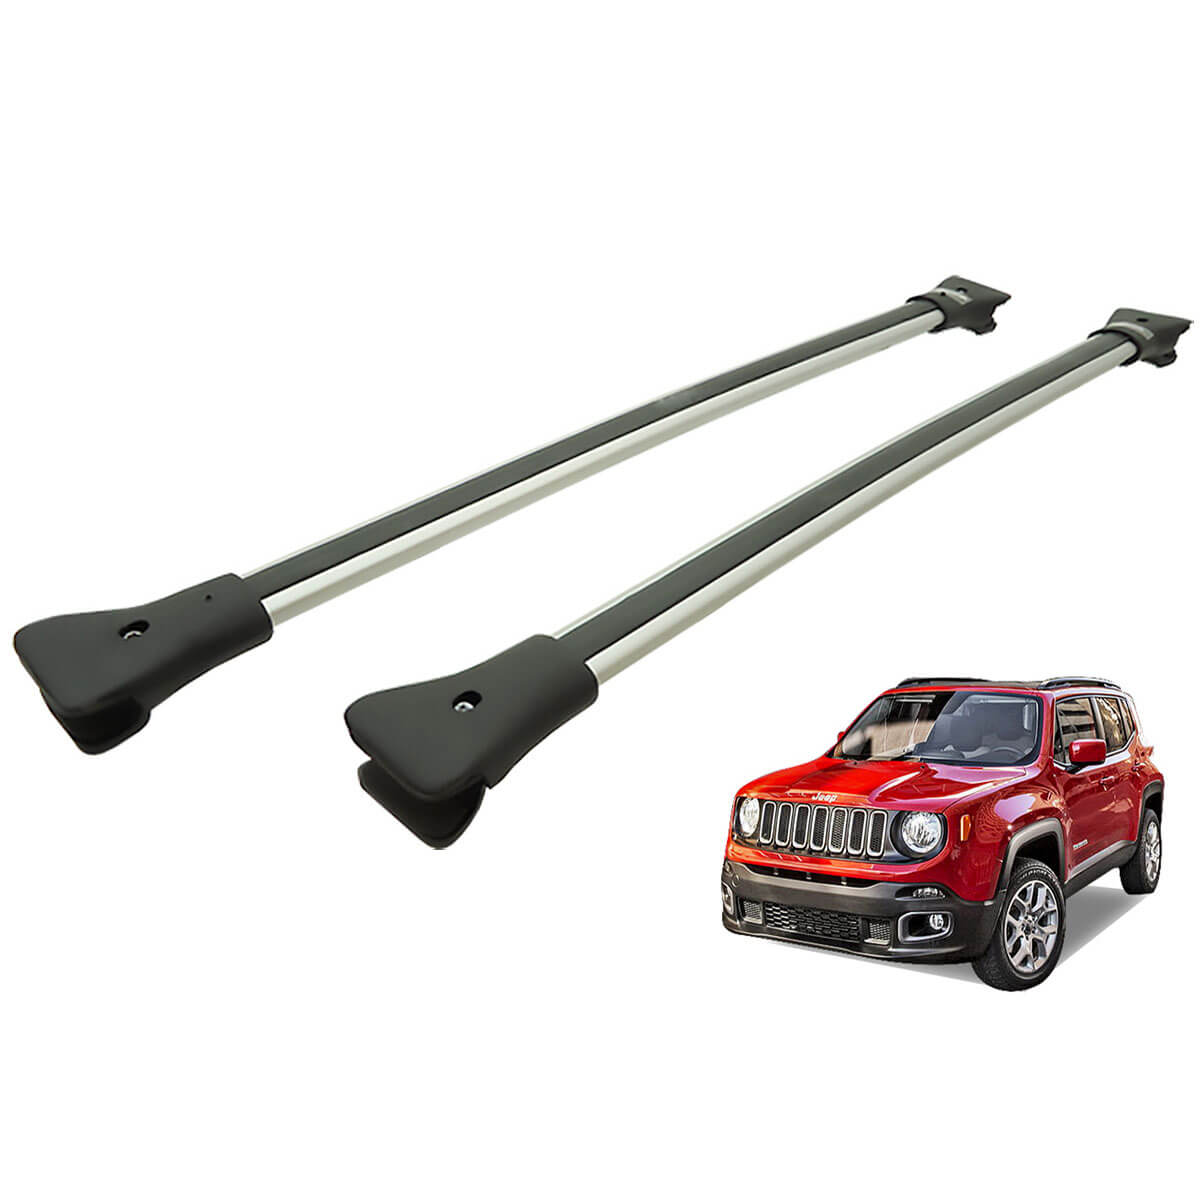 Travessa rack de teto larga alumínio Jeep Renegade 2016 2017 2018 2019